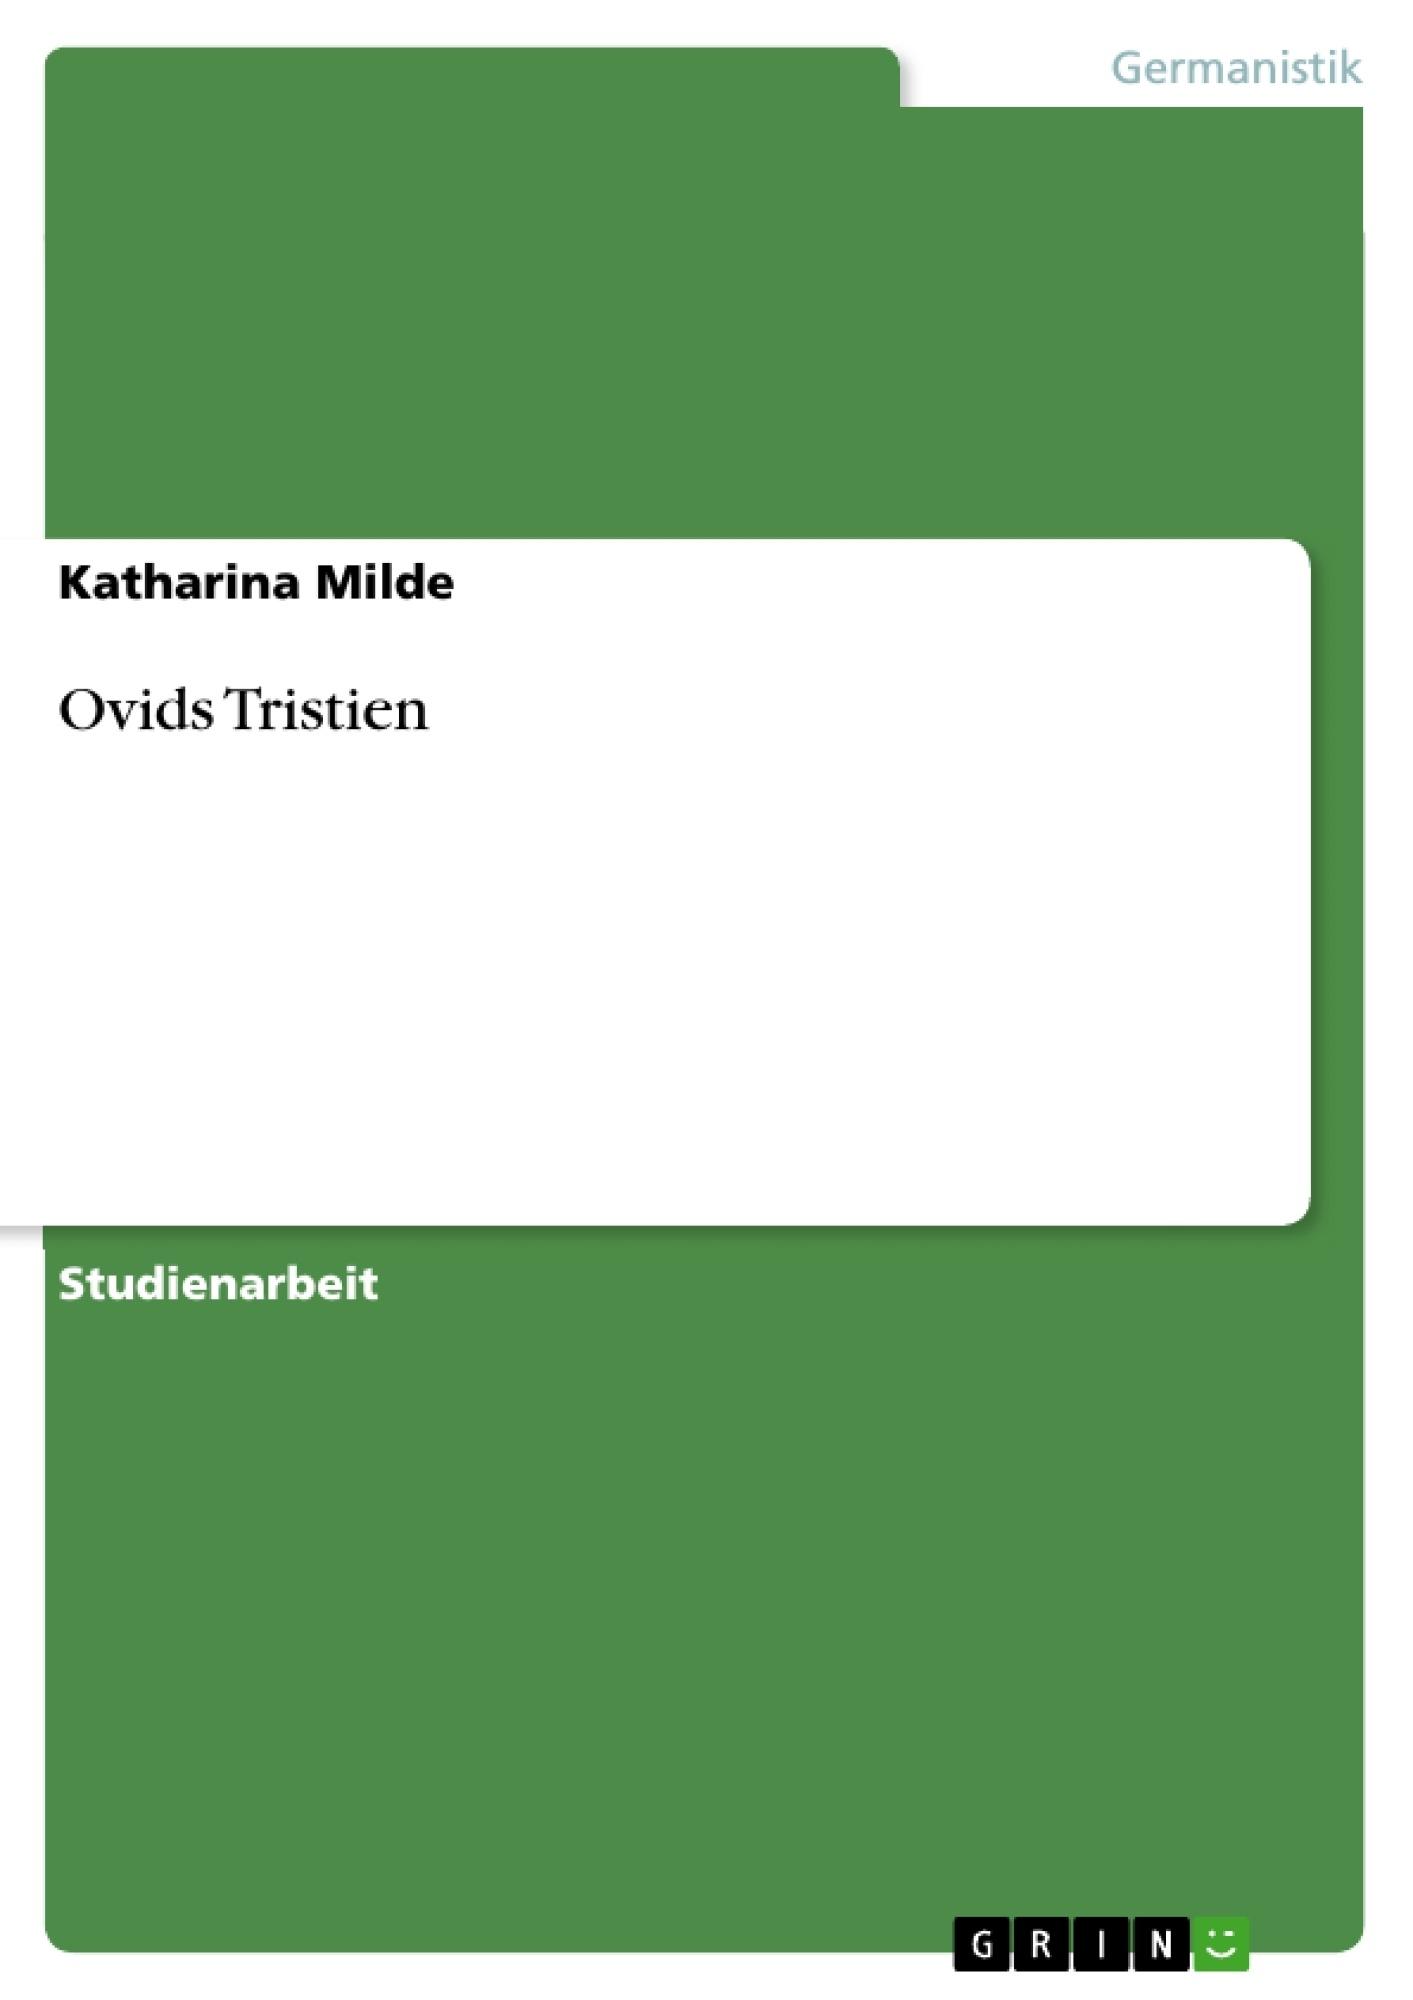 Titel: Ovids Tristien